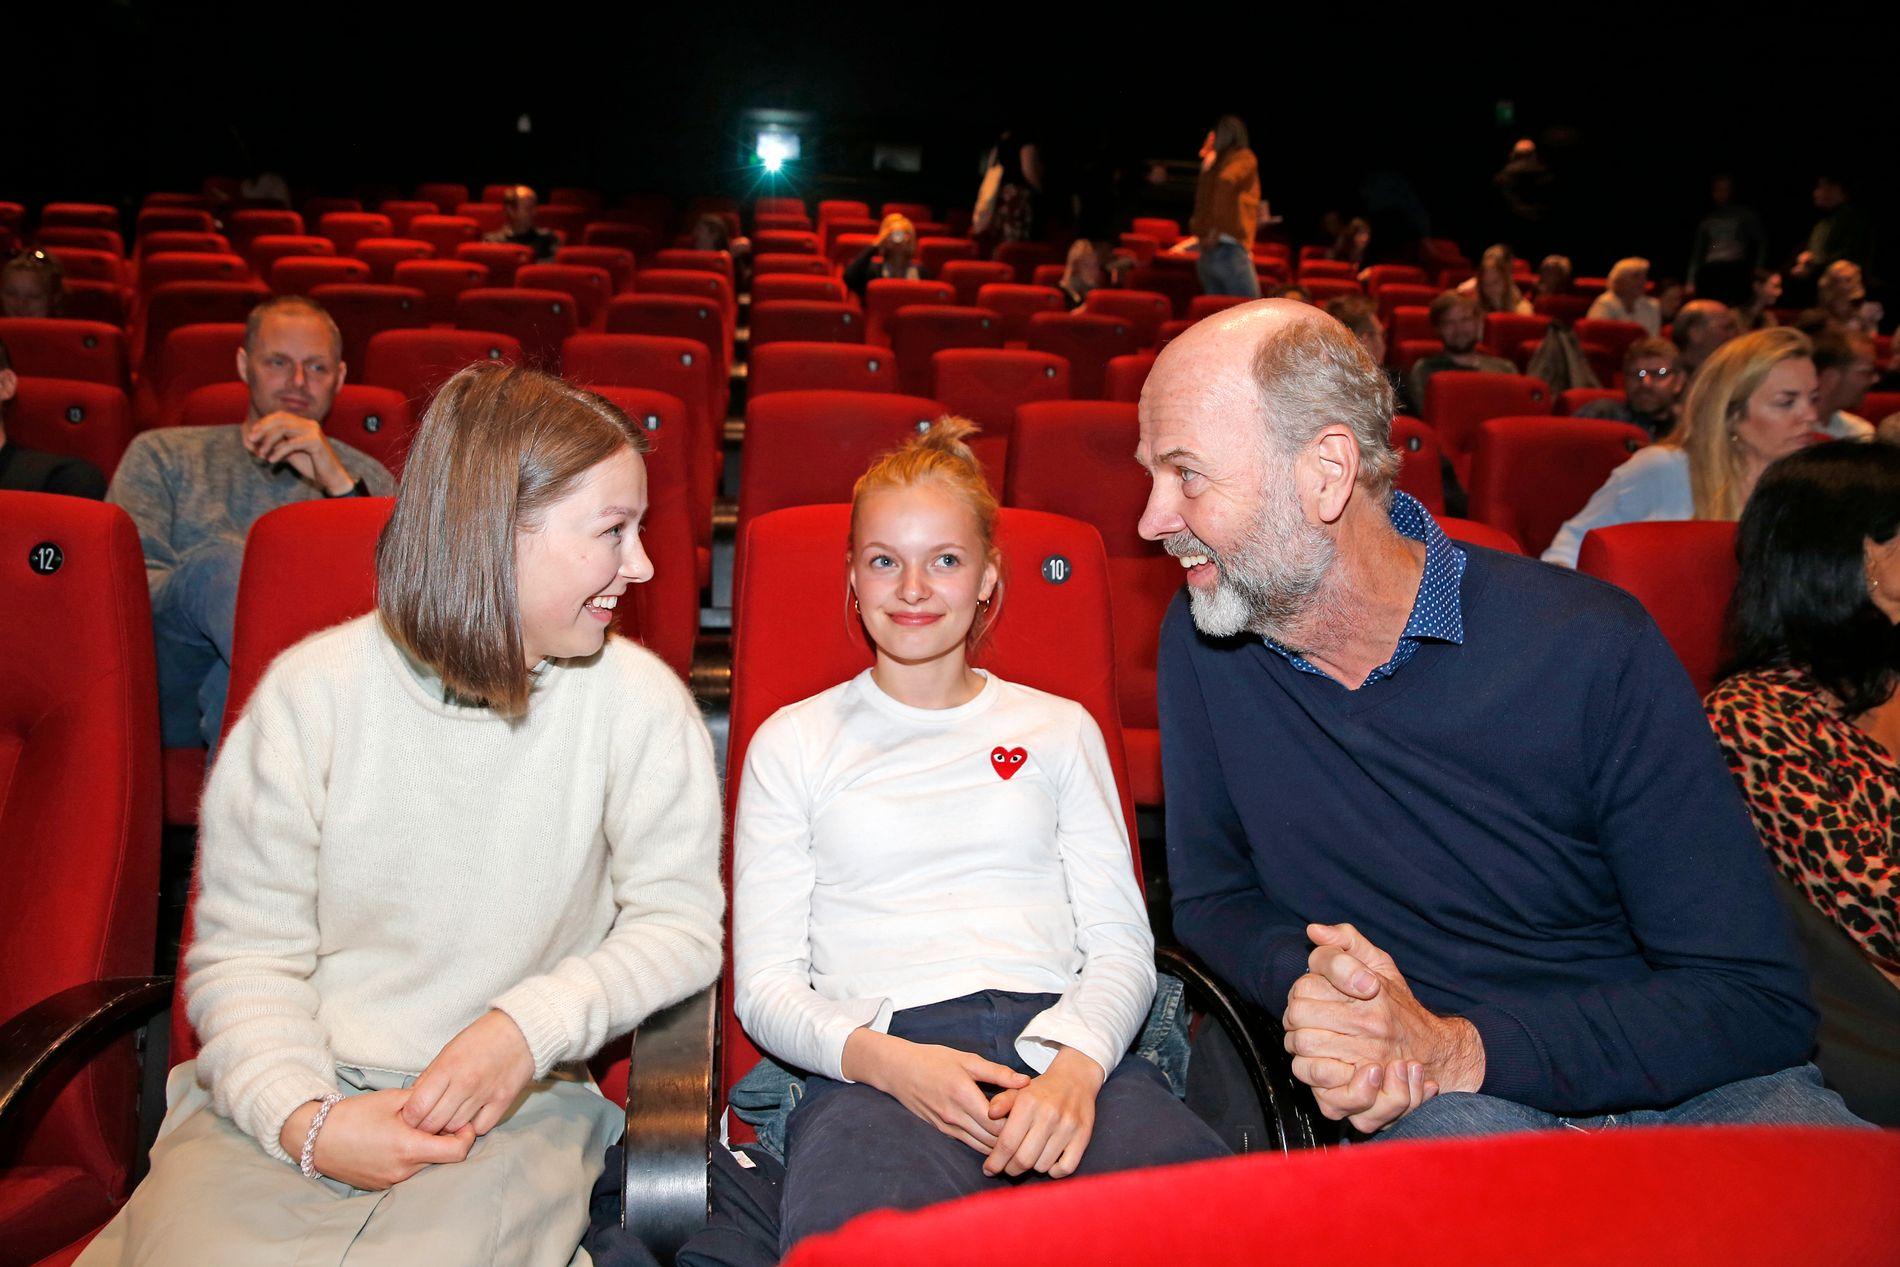 NOMINERT I SYV KATEGORIER: Både Andrea Berntzen, Solveig Koløen Birkeland og Erik Poppe er nominert til Amanda i år for «Utøya 22. juli».